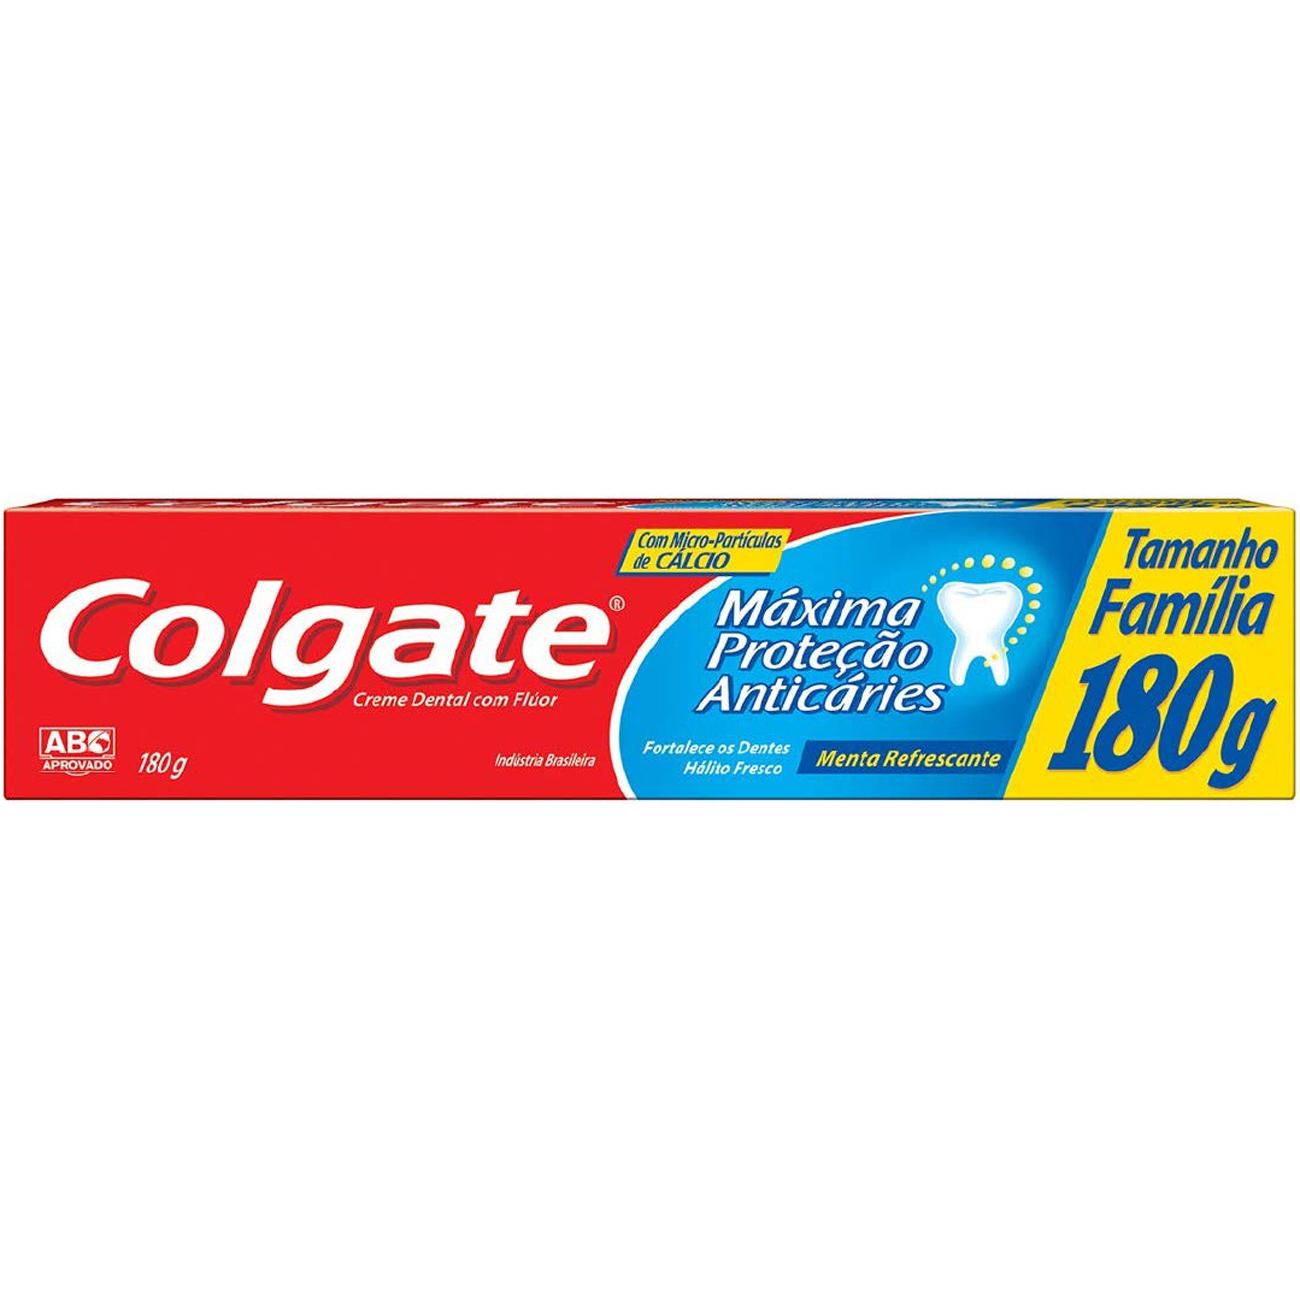 Creme Dental Colgate Maxima Protecao Anticaries 180G